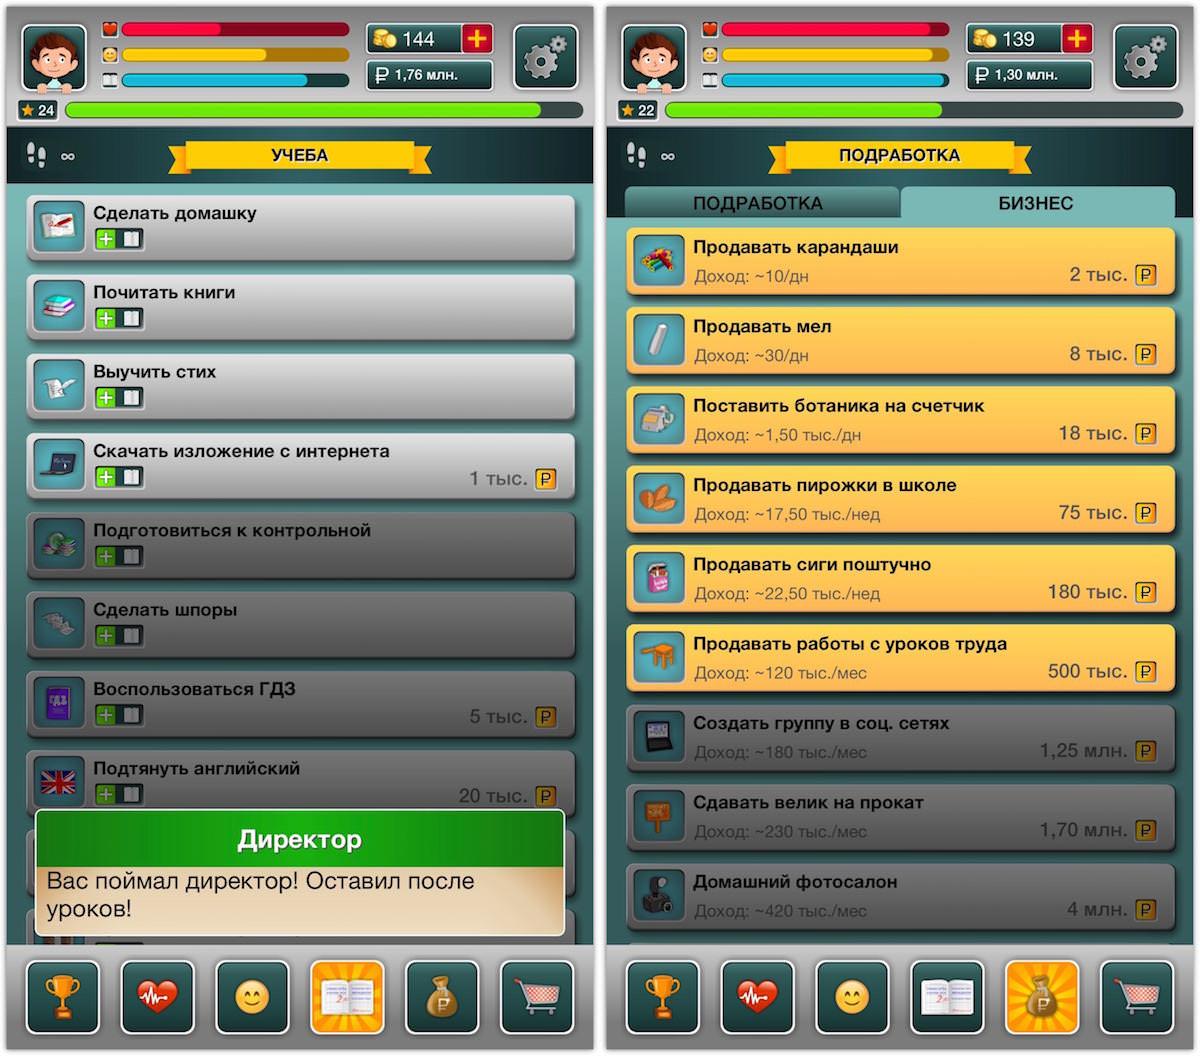 школьник симулятор Russia iOS iPhone iPad App Store 1